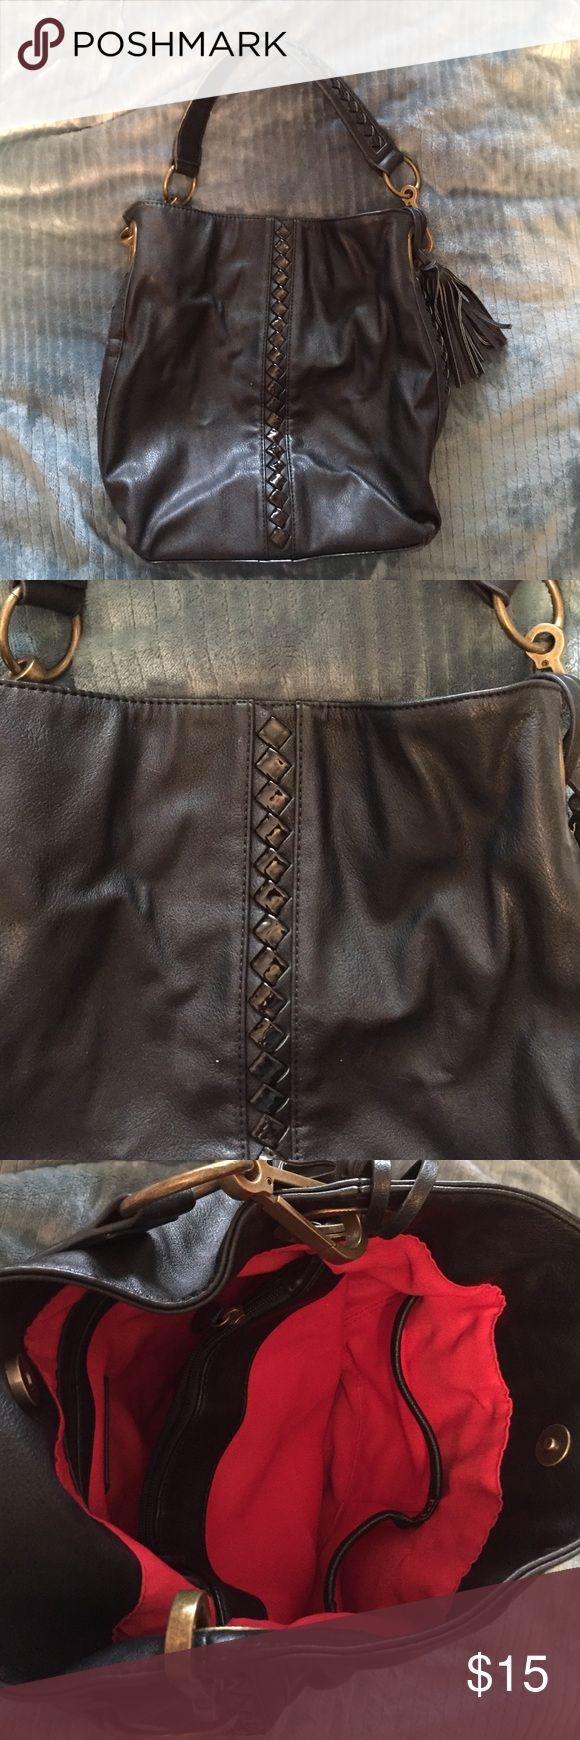 Selling this Carlos Santana black hobo bag on Poshmark! My username is: anc86. #shopmycloset #poshmark #fashion #shopping #style #forsale #Handbags